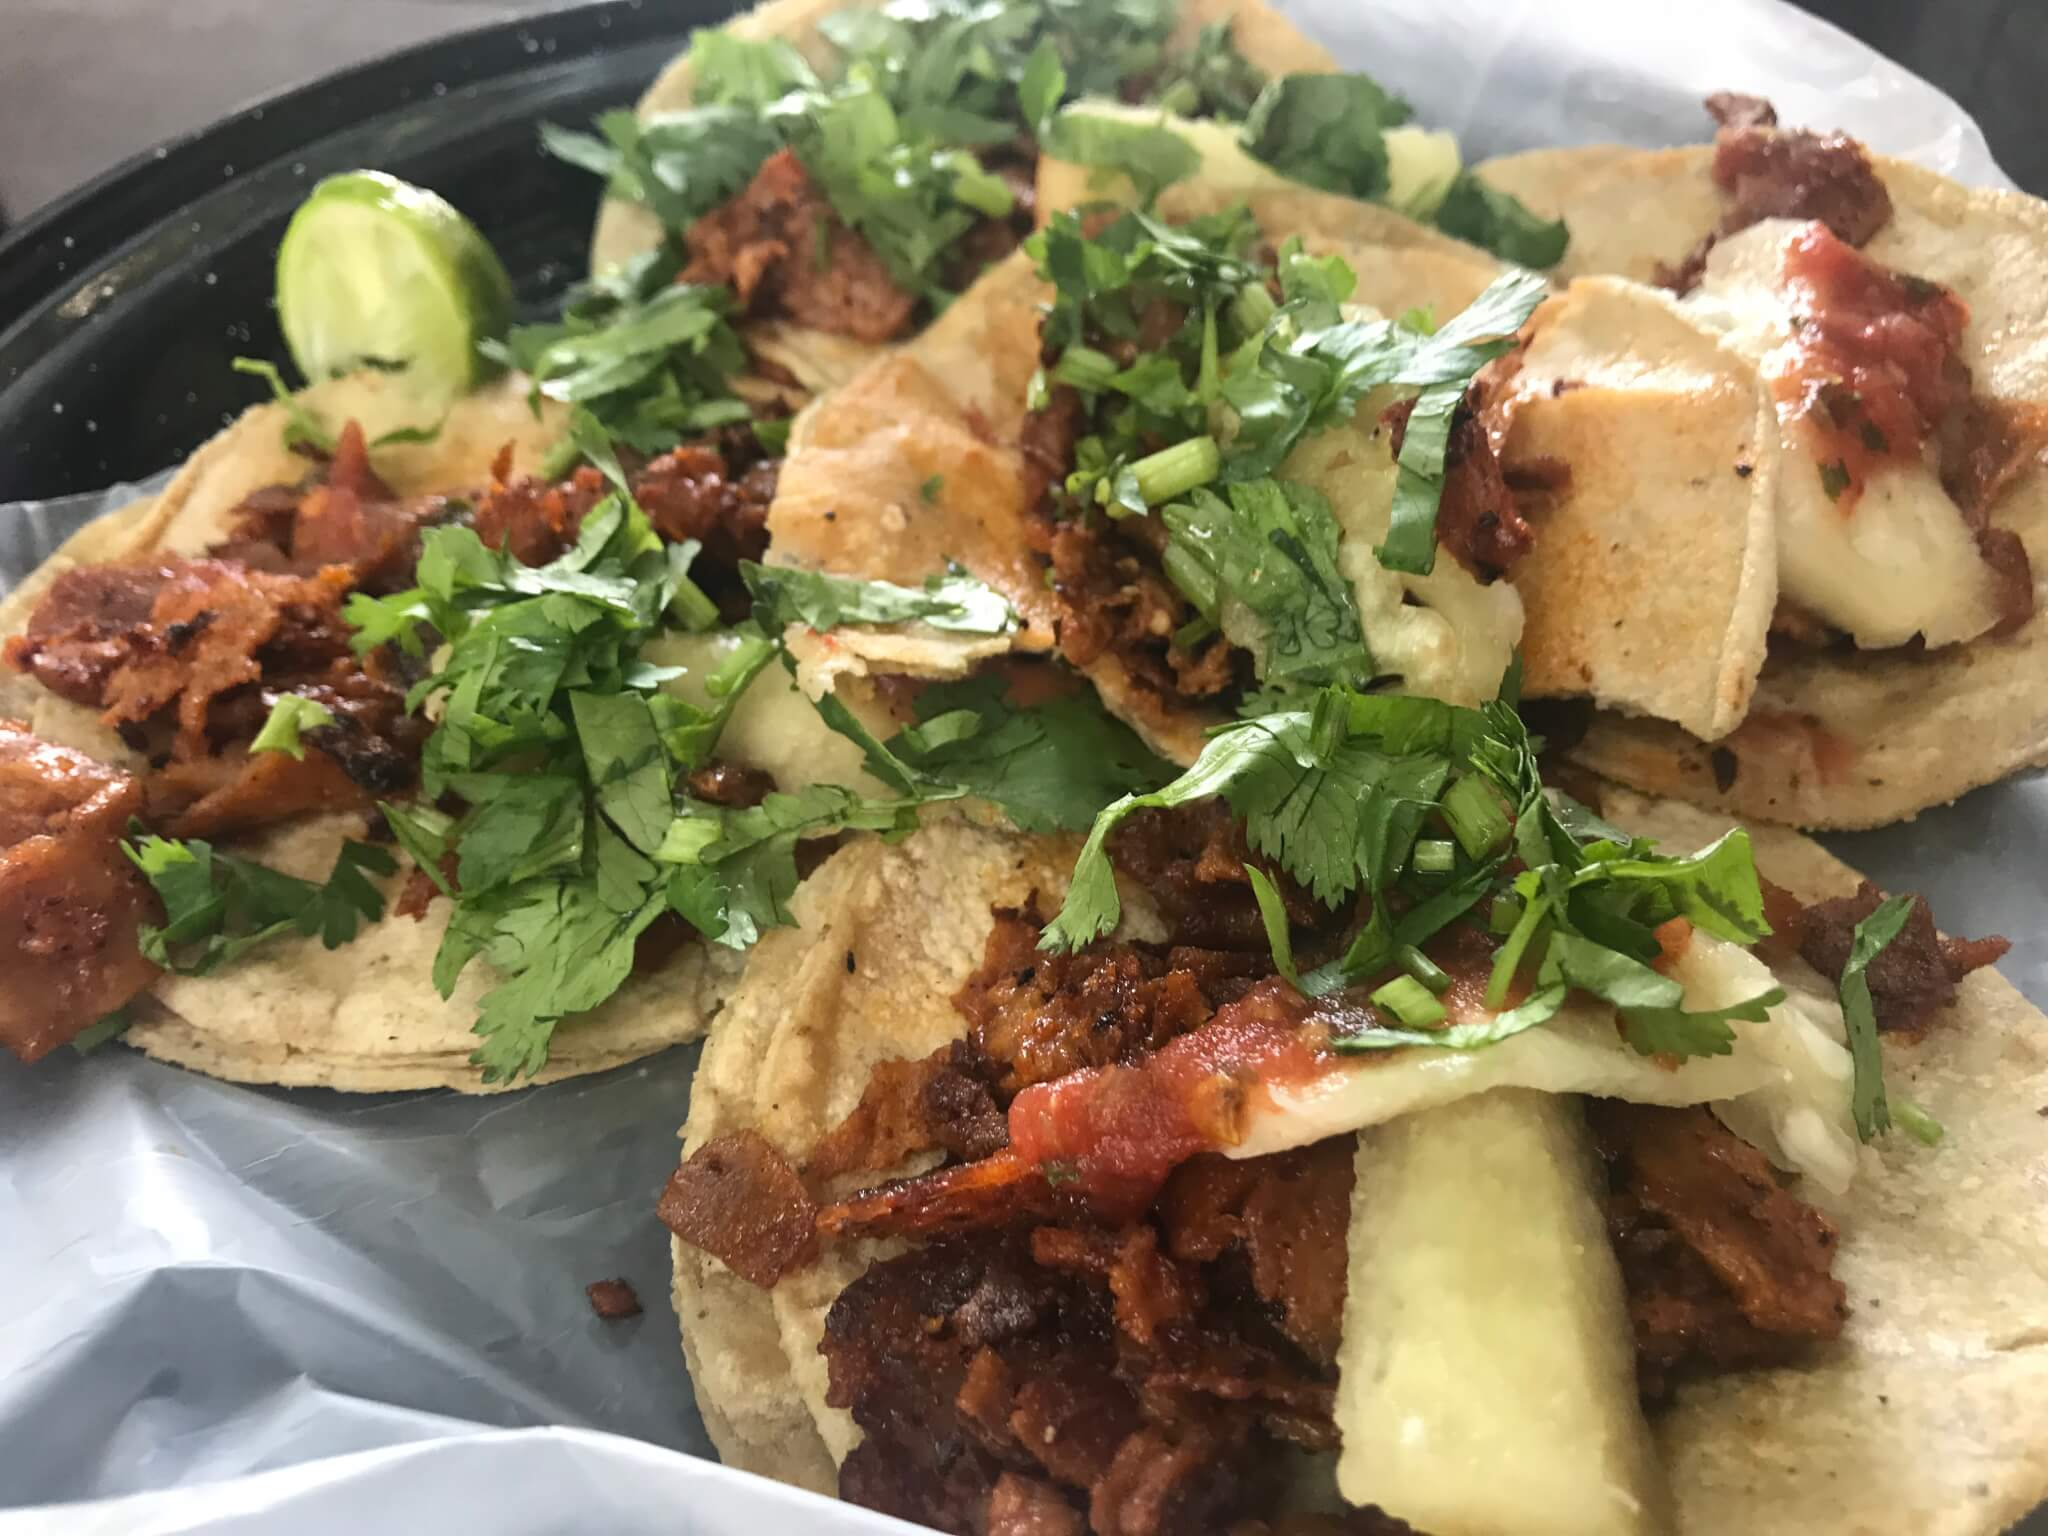 Vegan Street Tacos | Por Siempre Vegana | Things to do in Mexico City